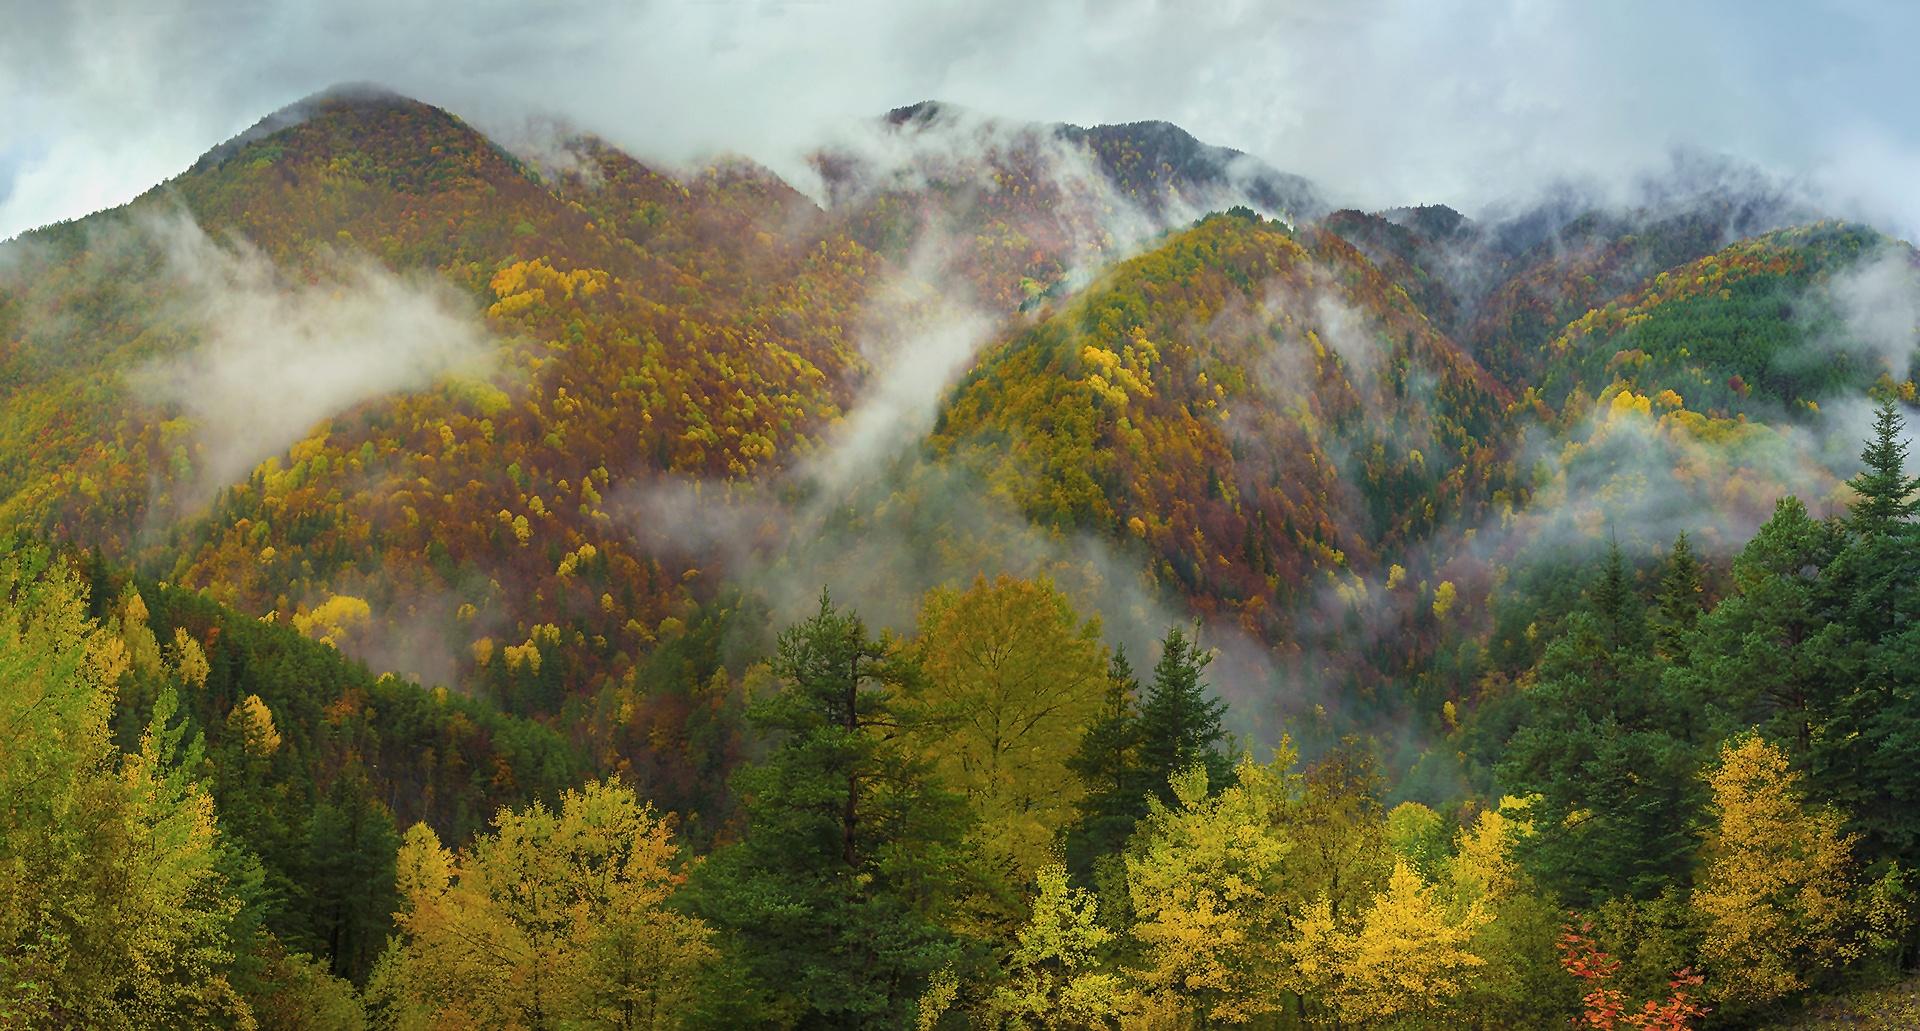 Ordesa - Undulations - Peter Manschot Al Andalus Photo Tour, Landscape photography photos prints workshops Andalusia Spain